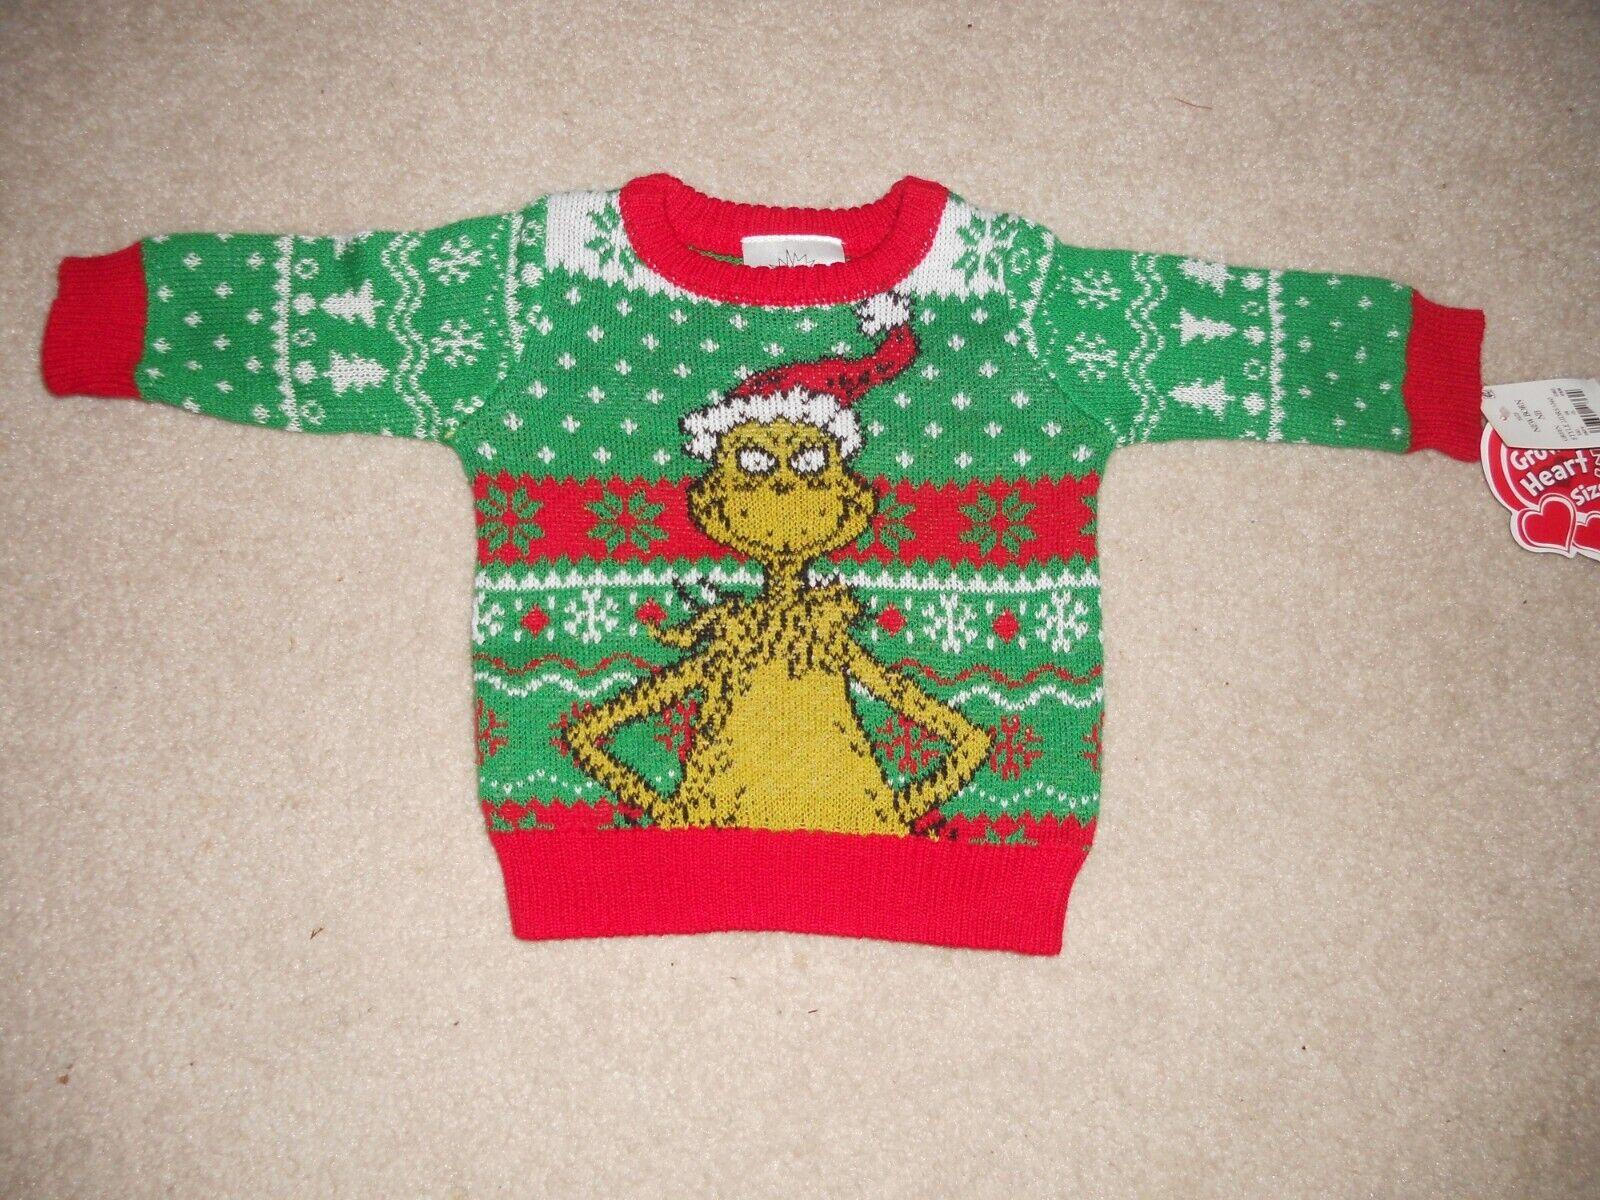 CafePress Snoopy Ugly Christmas Baby Bodysuit 2007780761